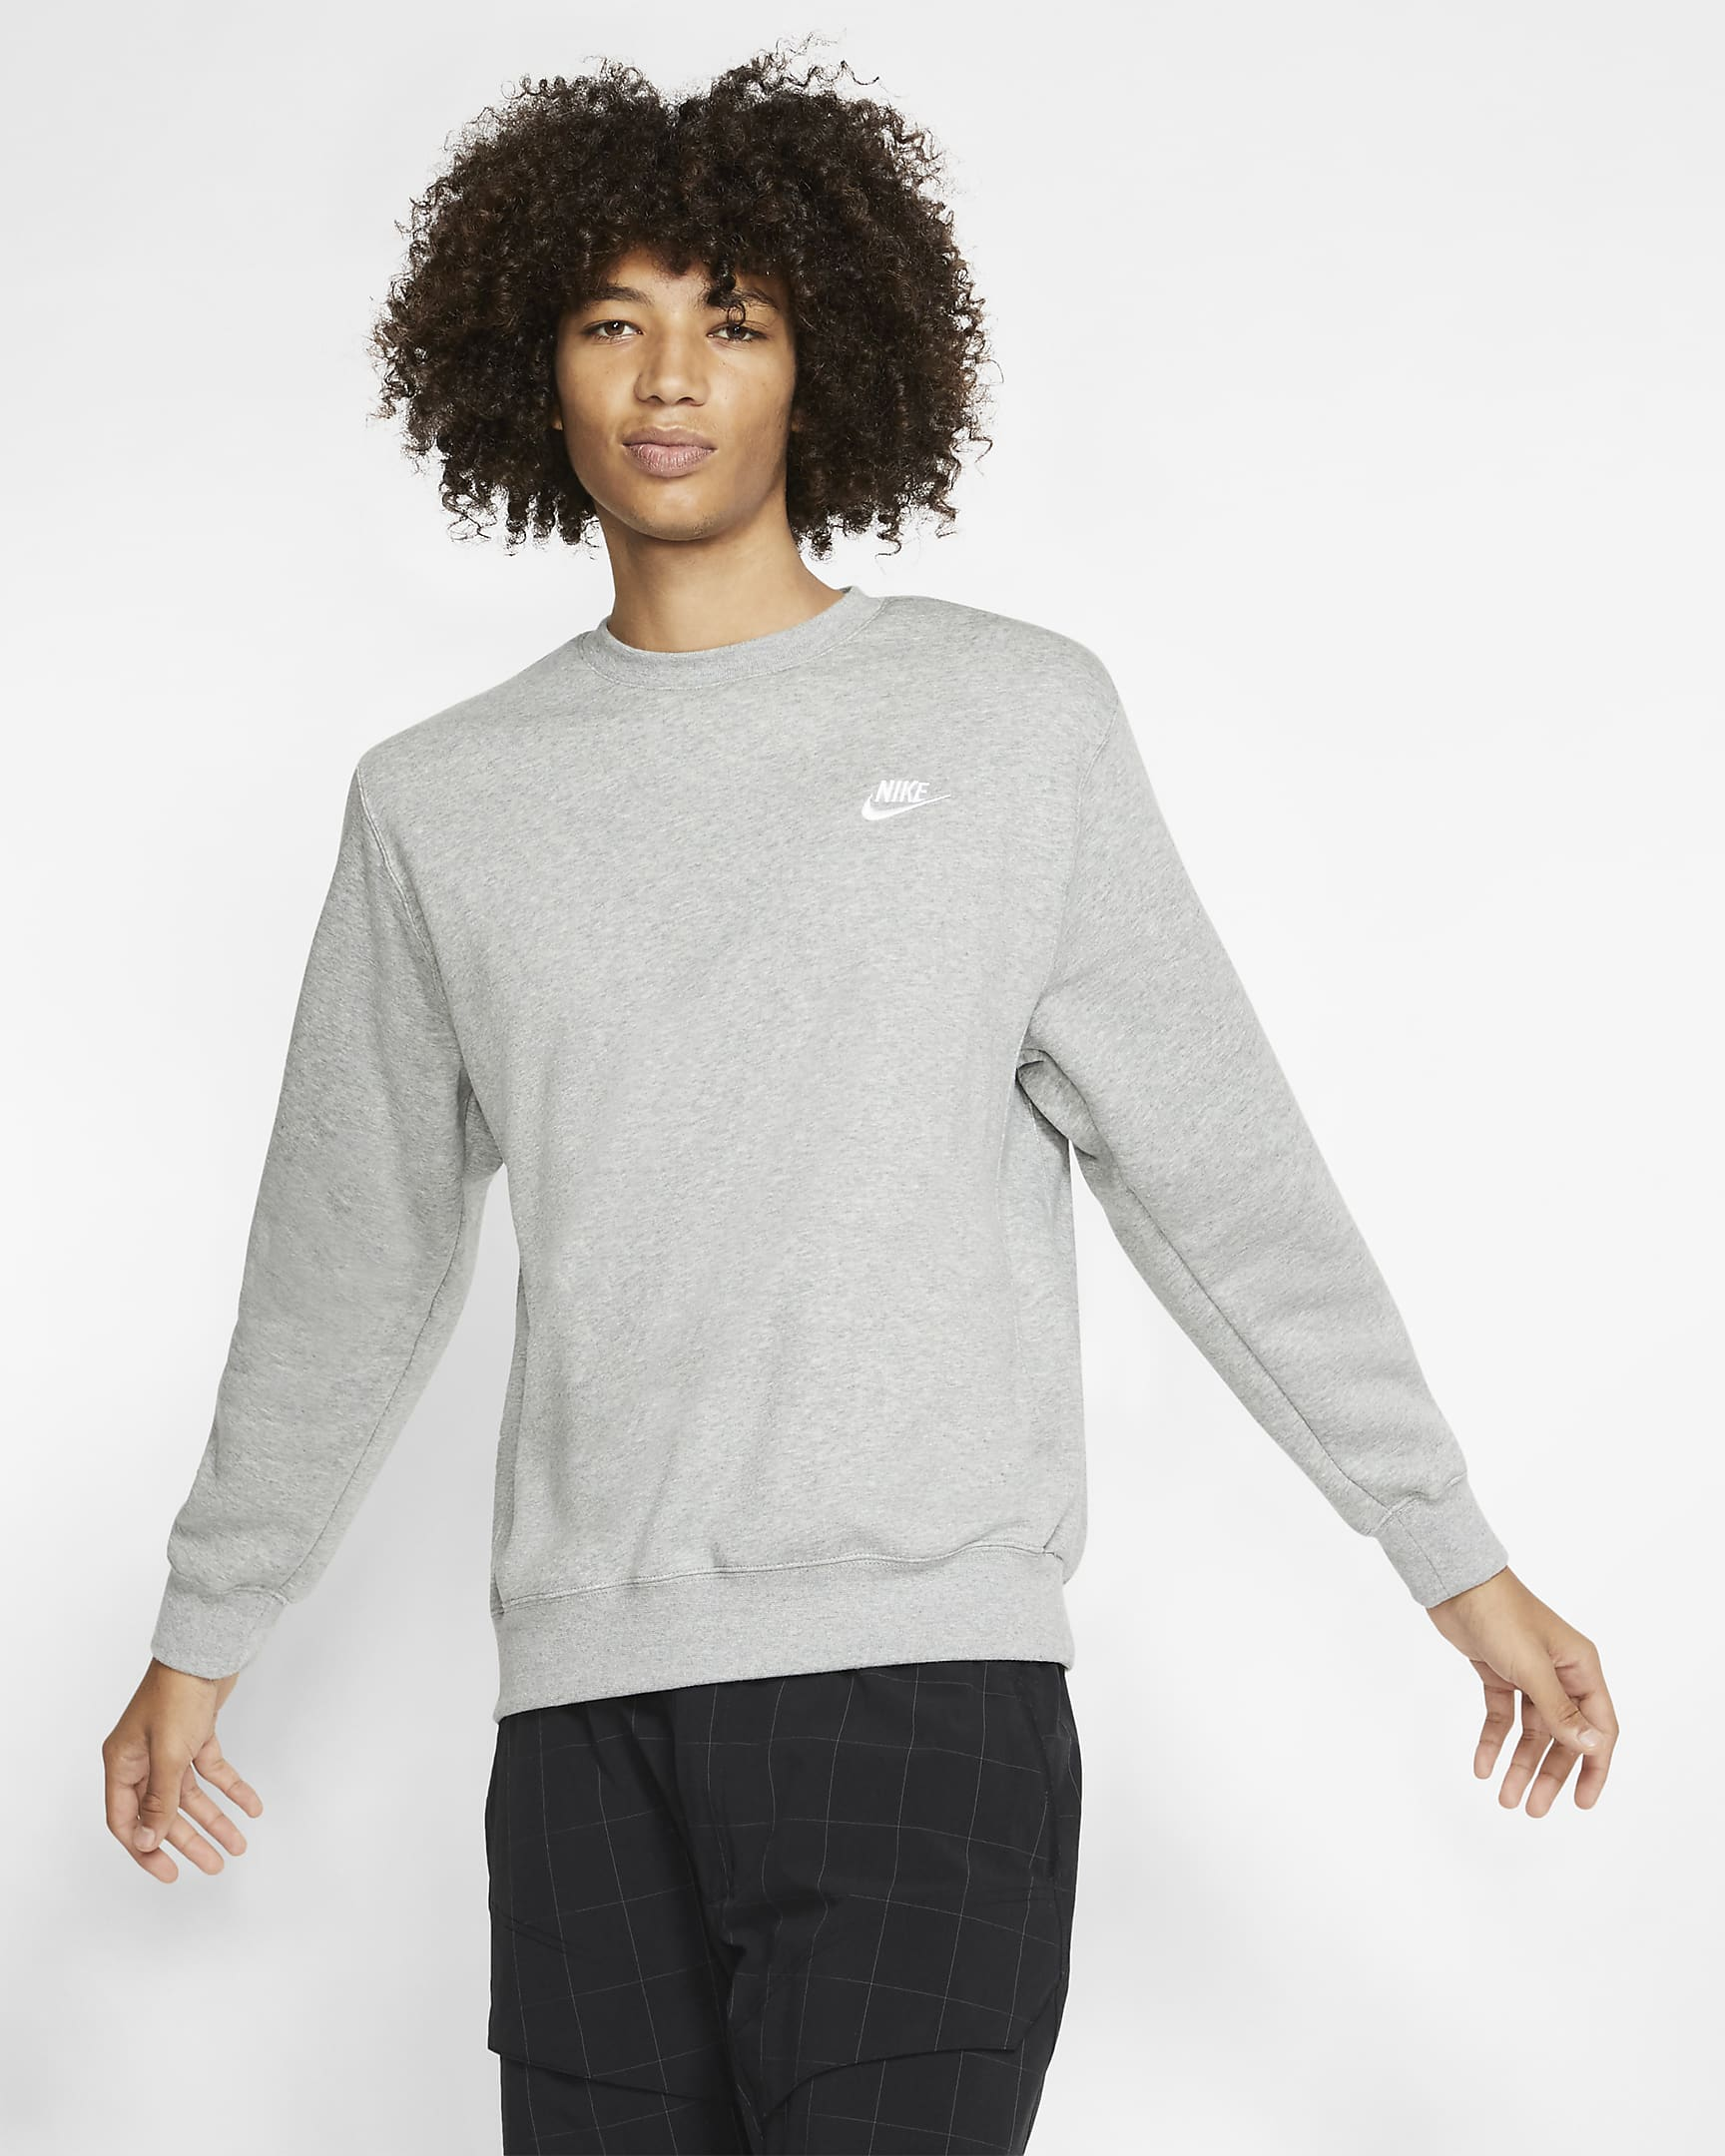 nike-sportswear-club-fleece-crew-TWcqLw.png